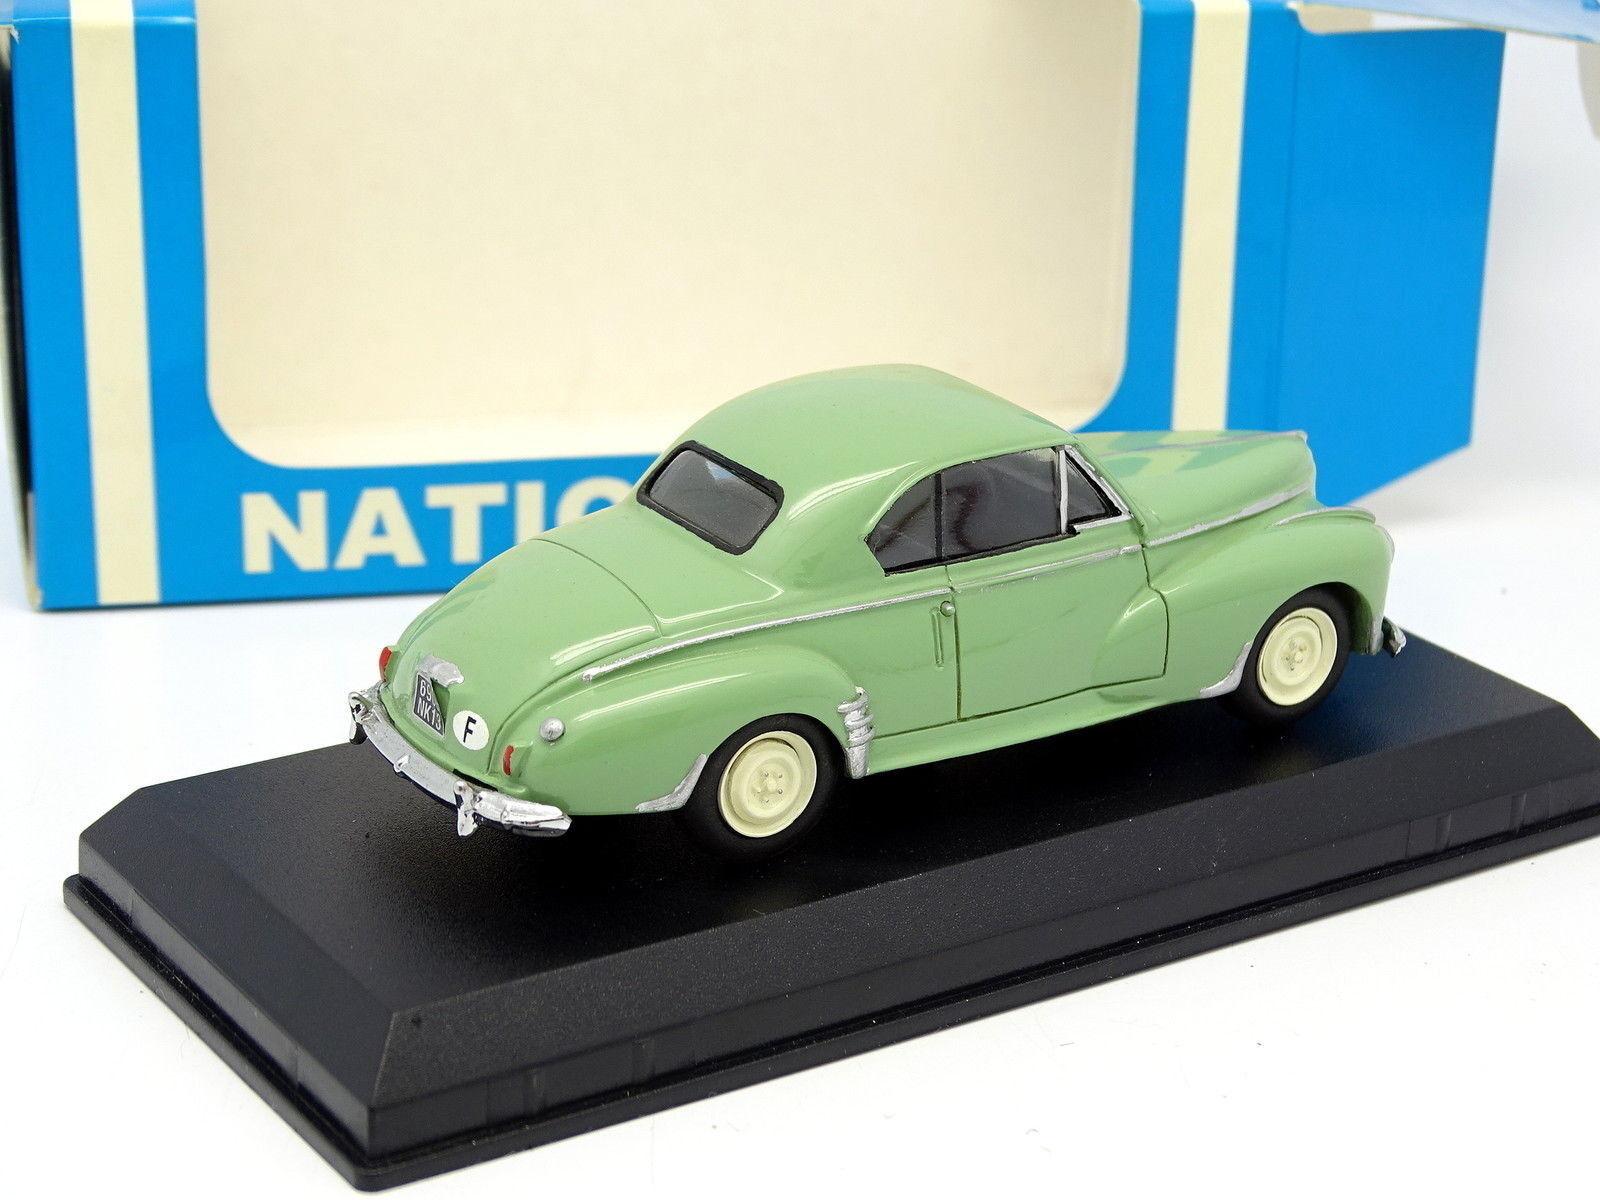 Starter N7 Provence Résine 1 43 - - - Peugeot 203 Coupe verdee 1953 6a3032